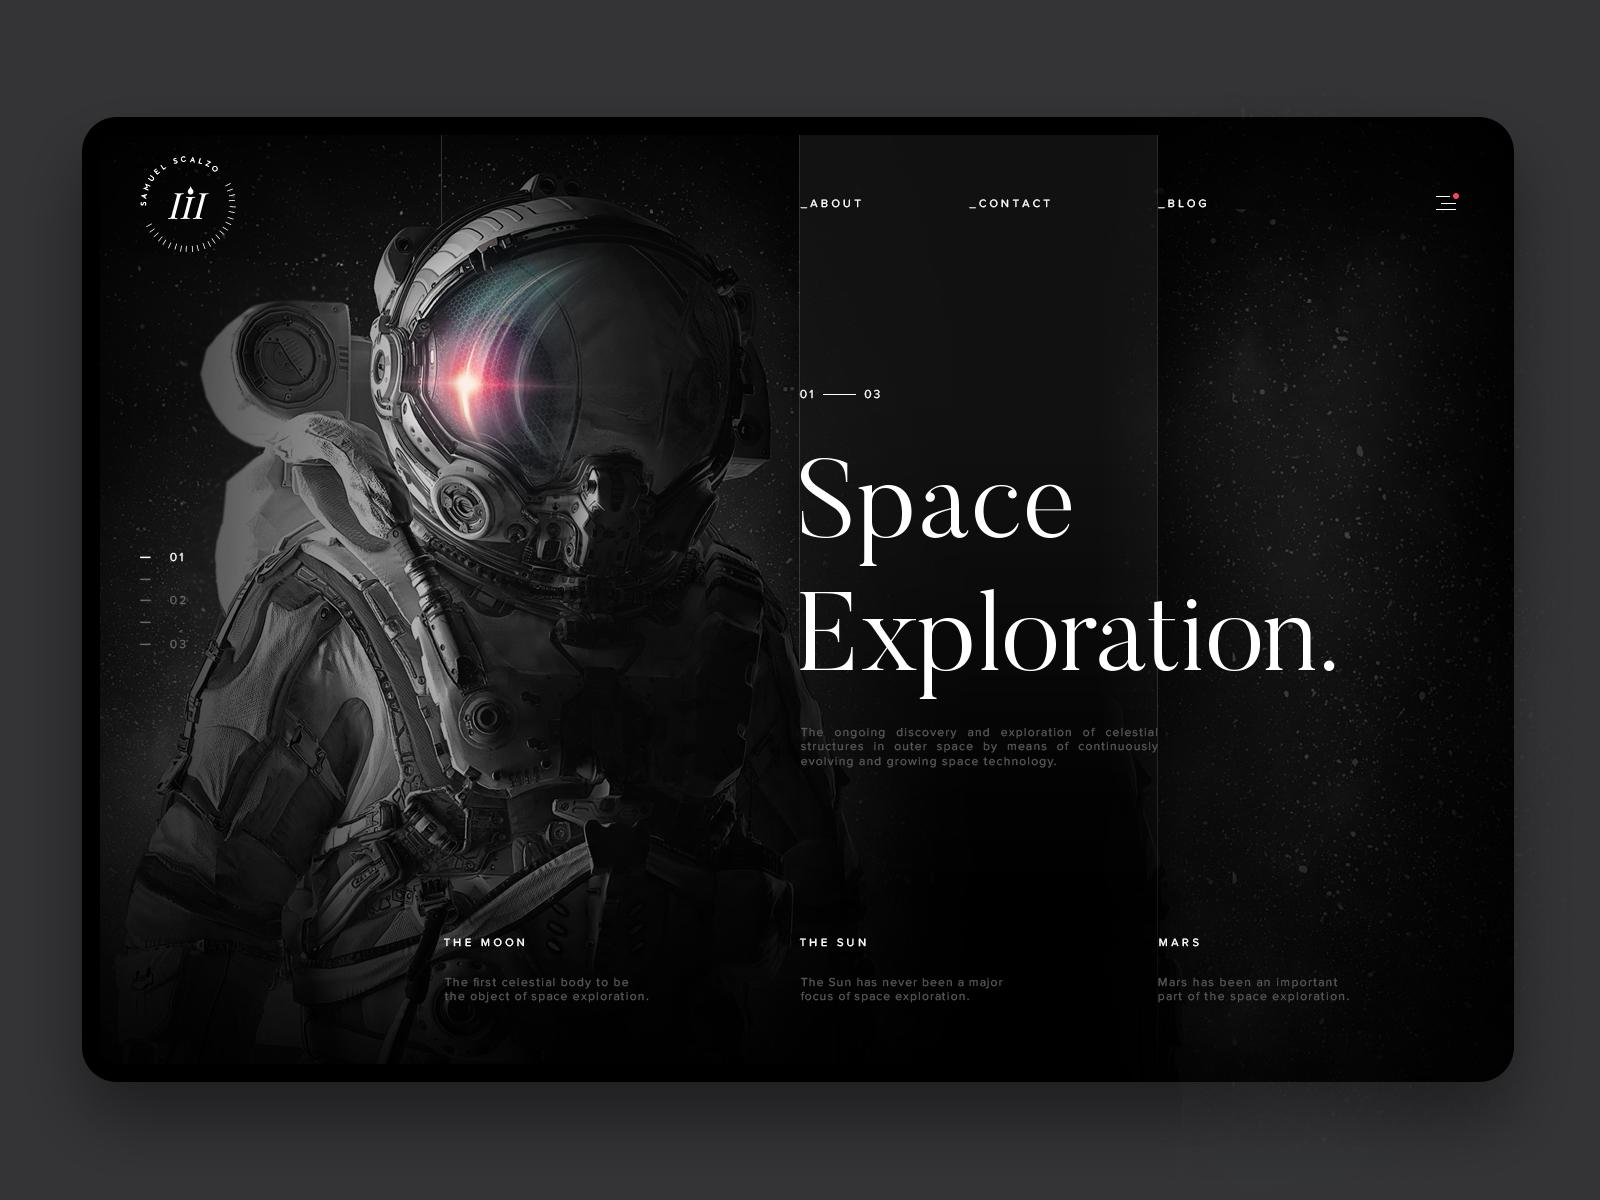 Space exploration webdesign hd